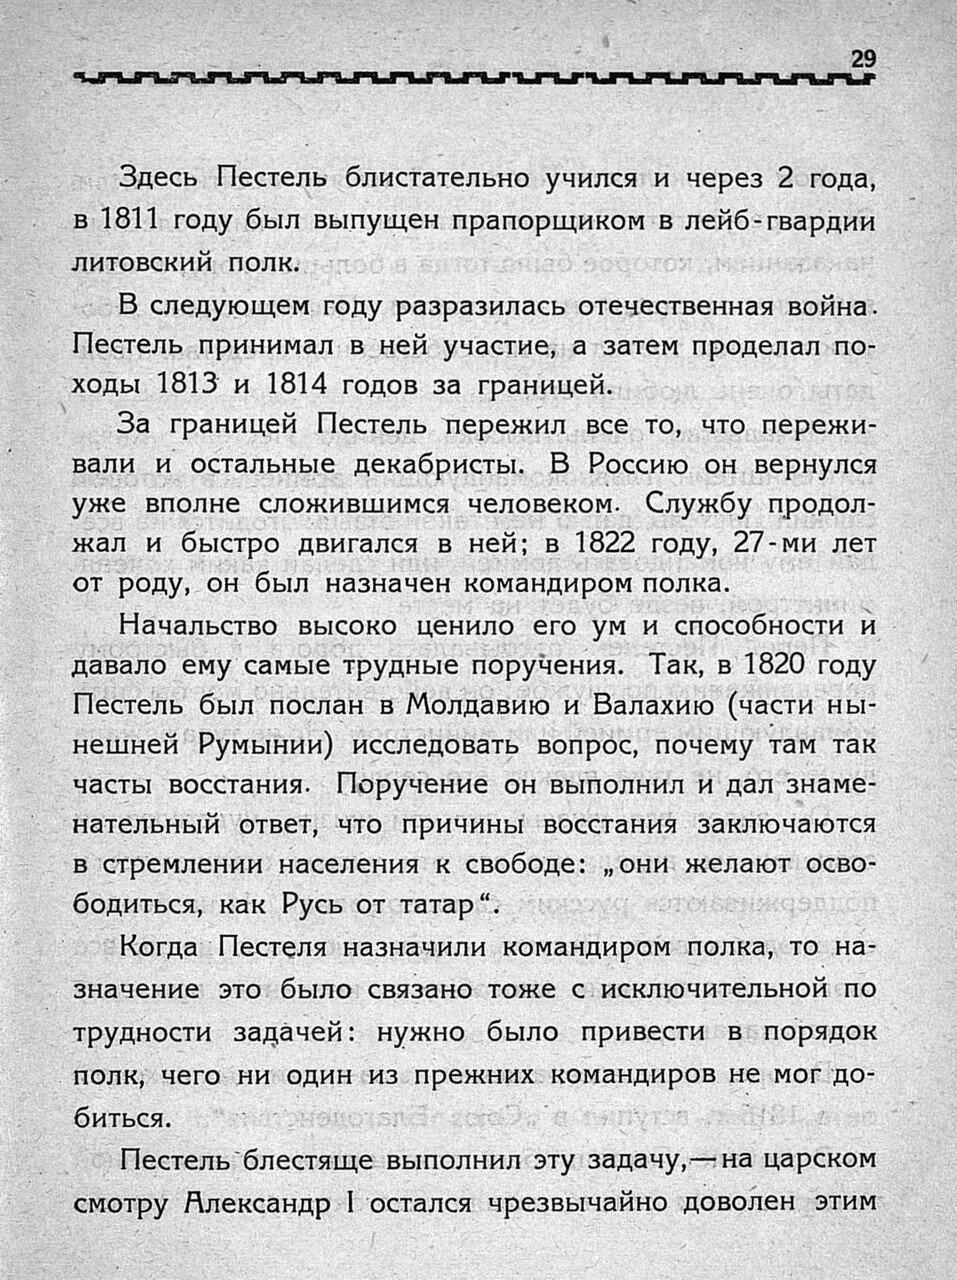 https://img-fotki.yandex.ru/get/112407/199368979.23/0_1bfae1_50668b9f_XXXL.jpg